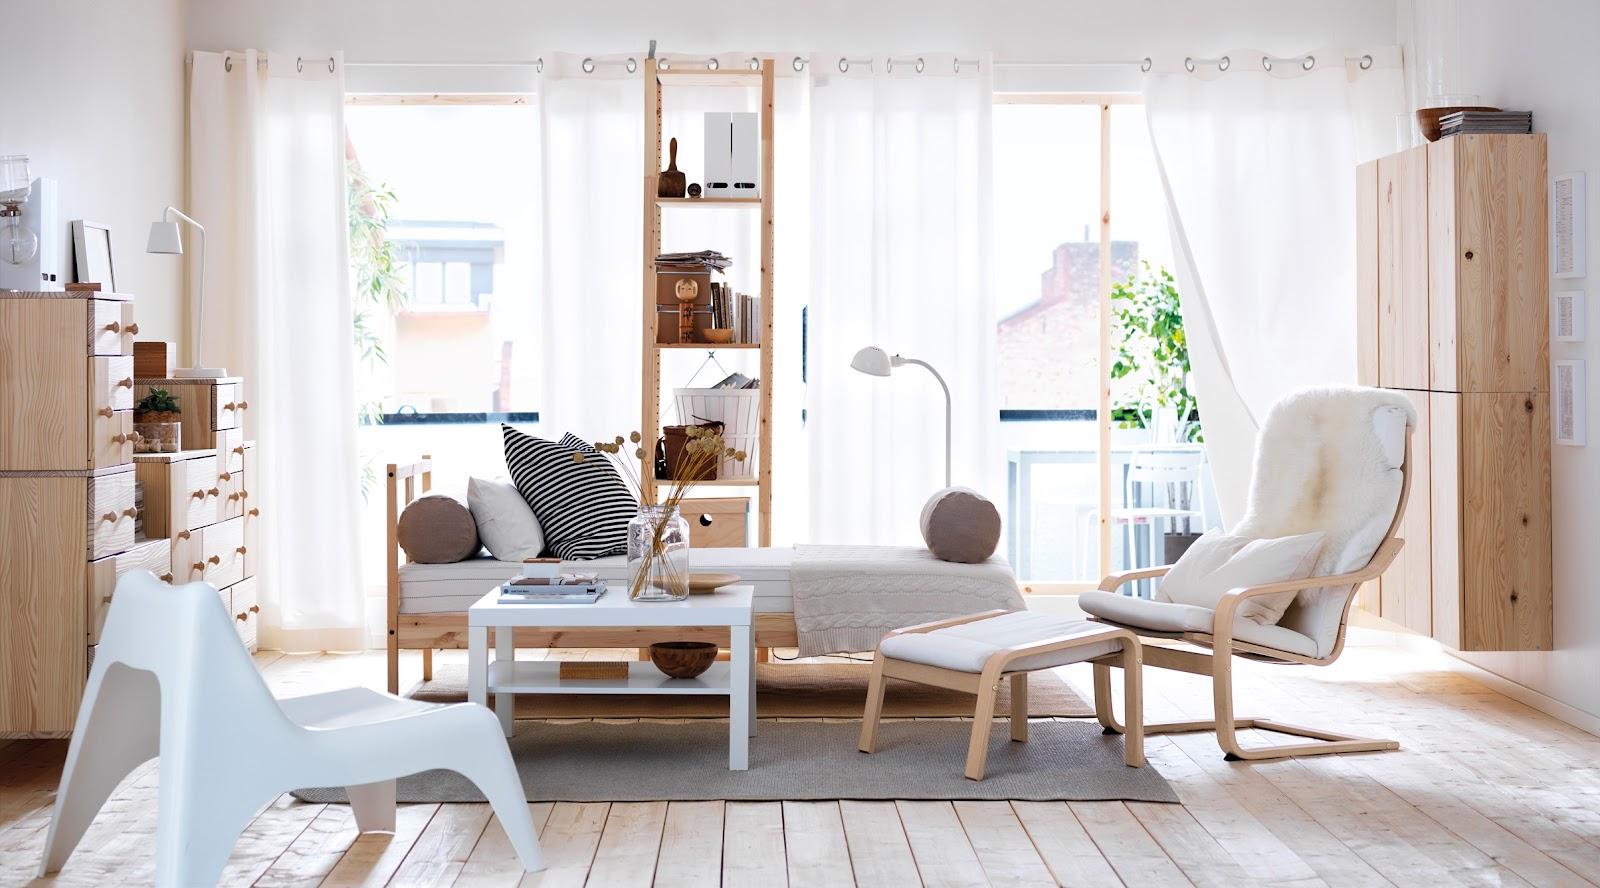 flechazos de ikea 2013 ministry of deco. Black Bedroom Furniture Sets. Home Design Ideas